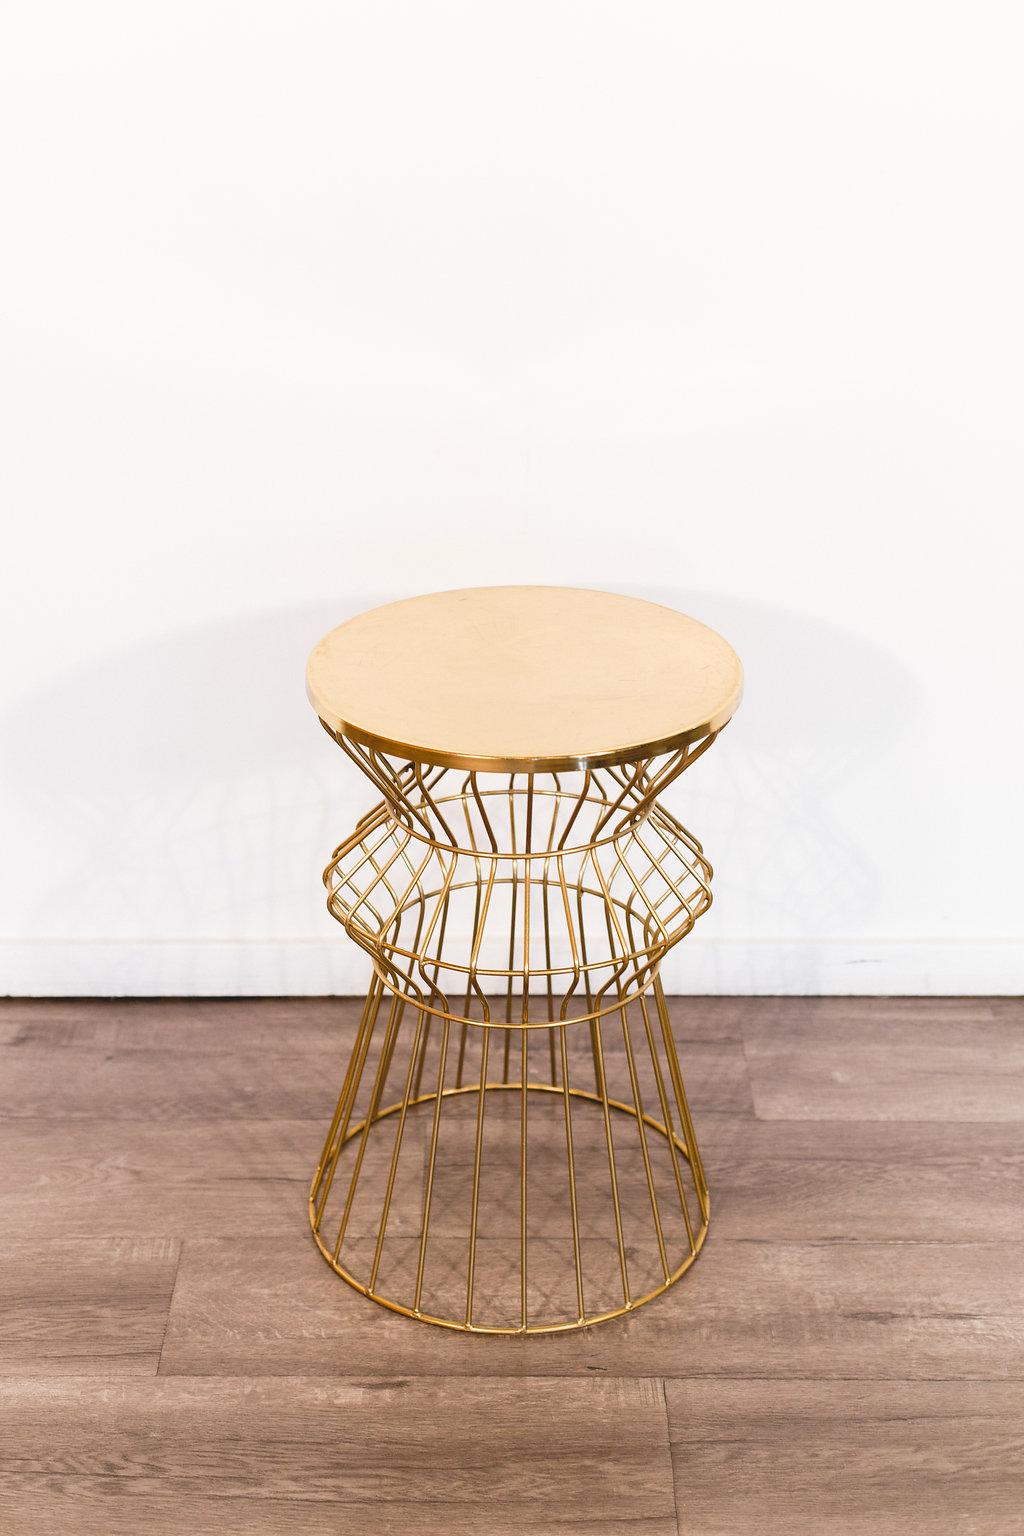 "Gold Table 15"" diameter 22.5"" tall Quantity: 1 Price: $50"